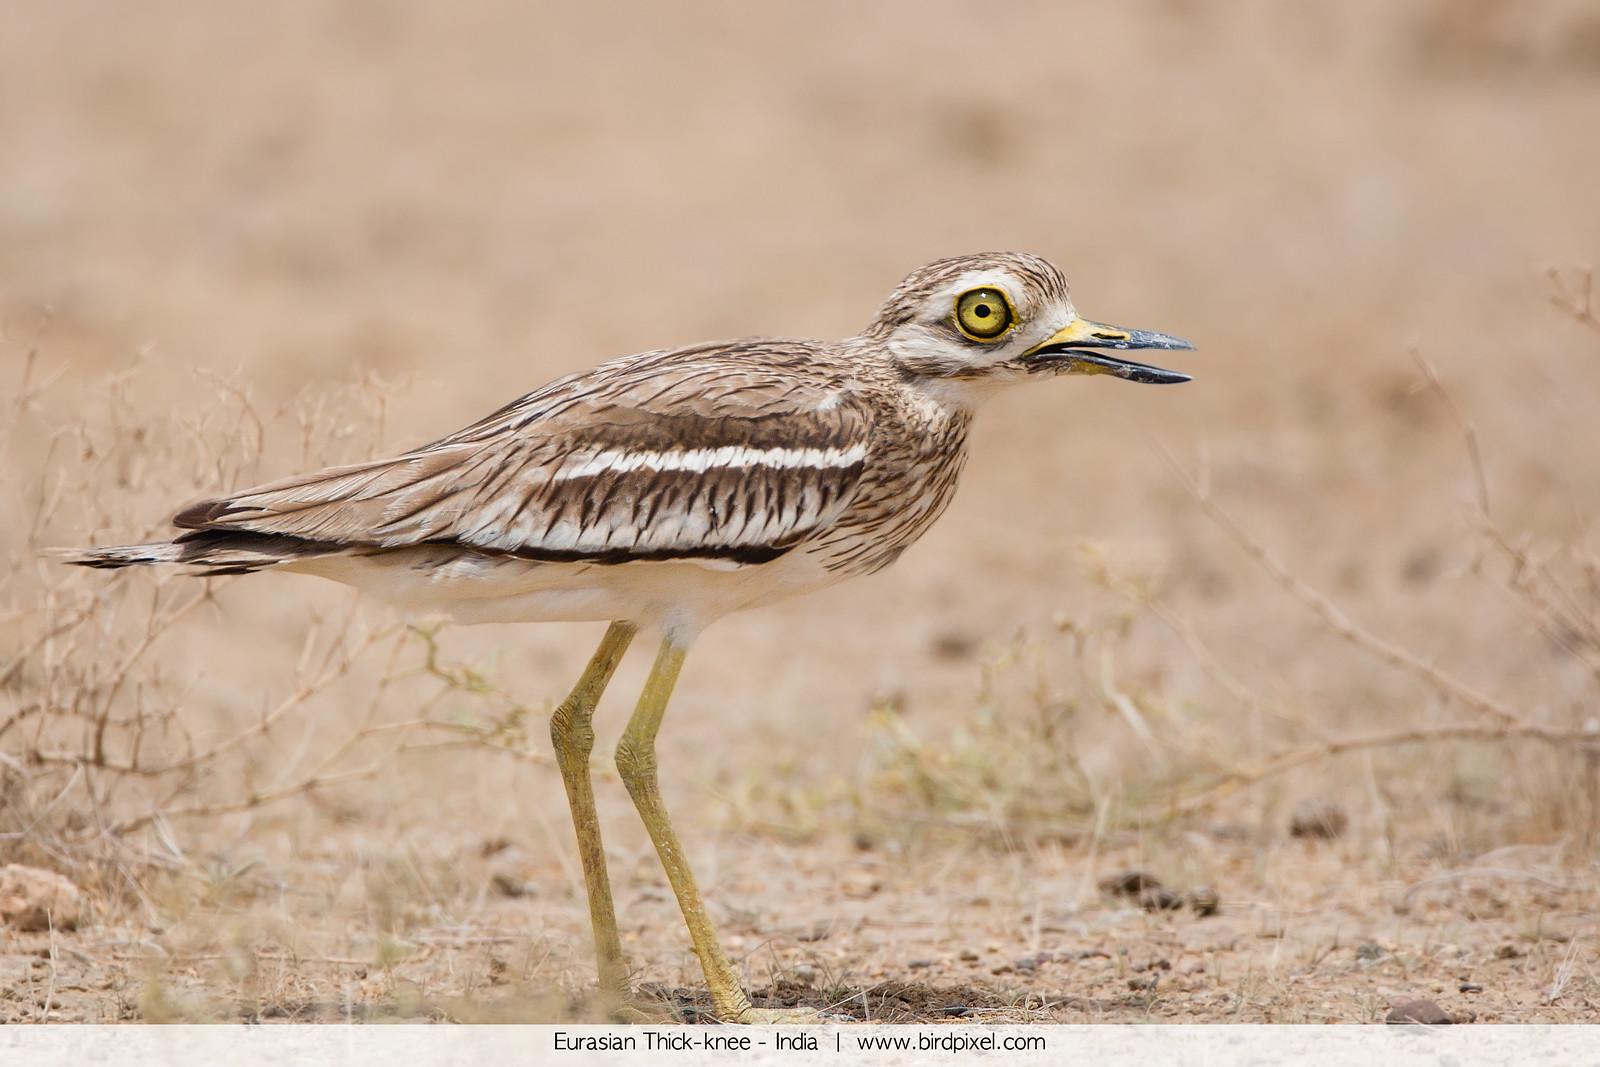 Eurasian Thick-knee - India